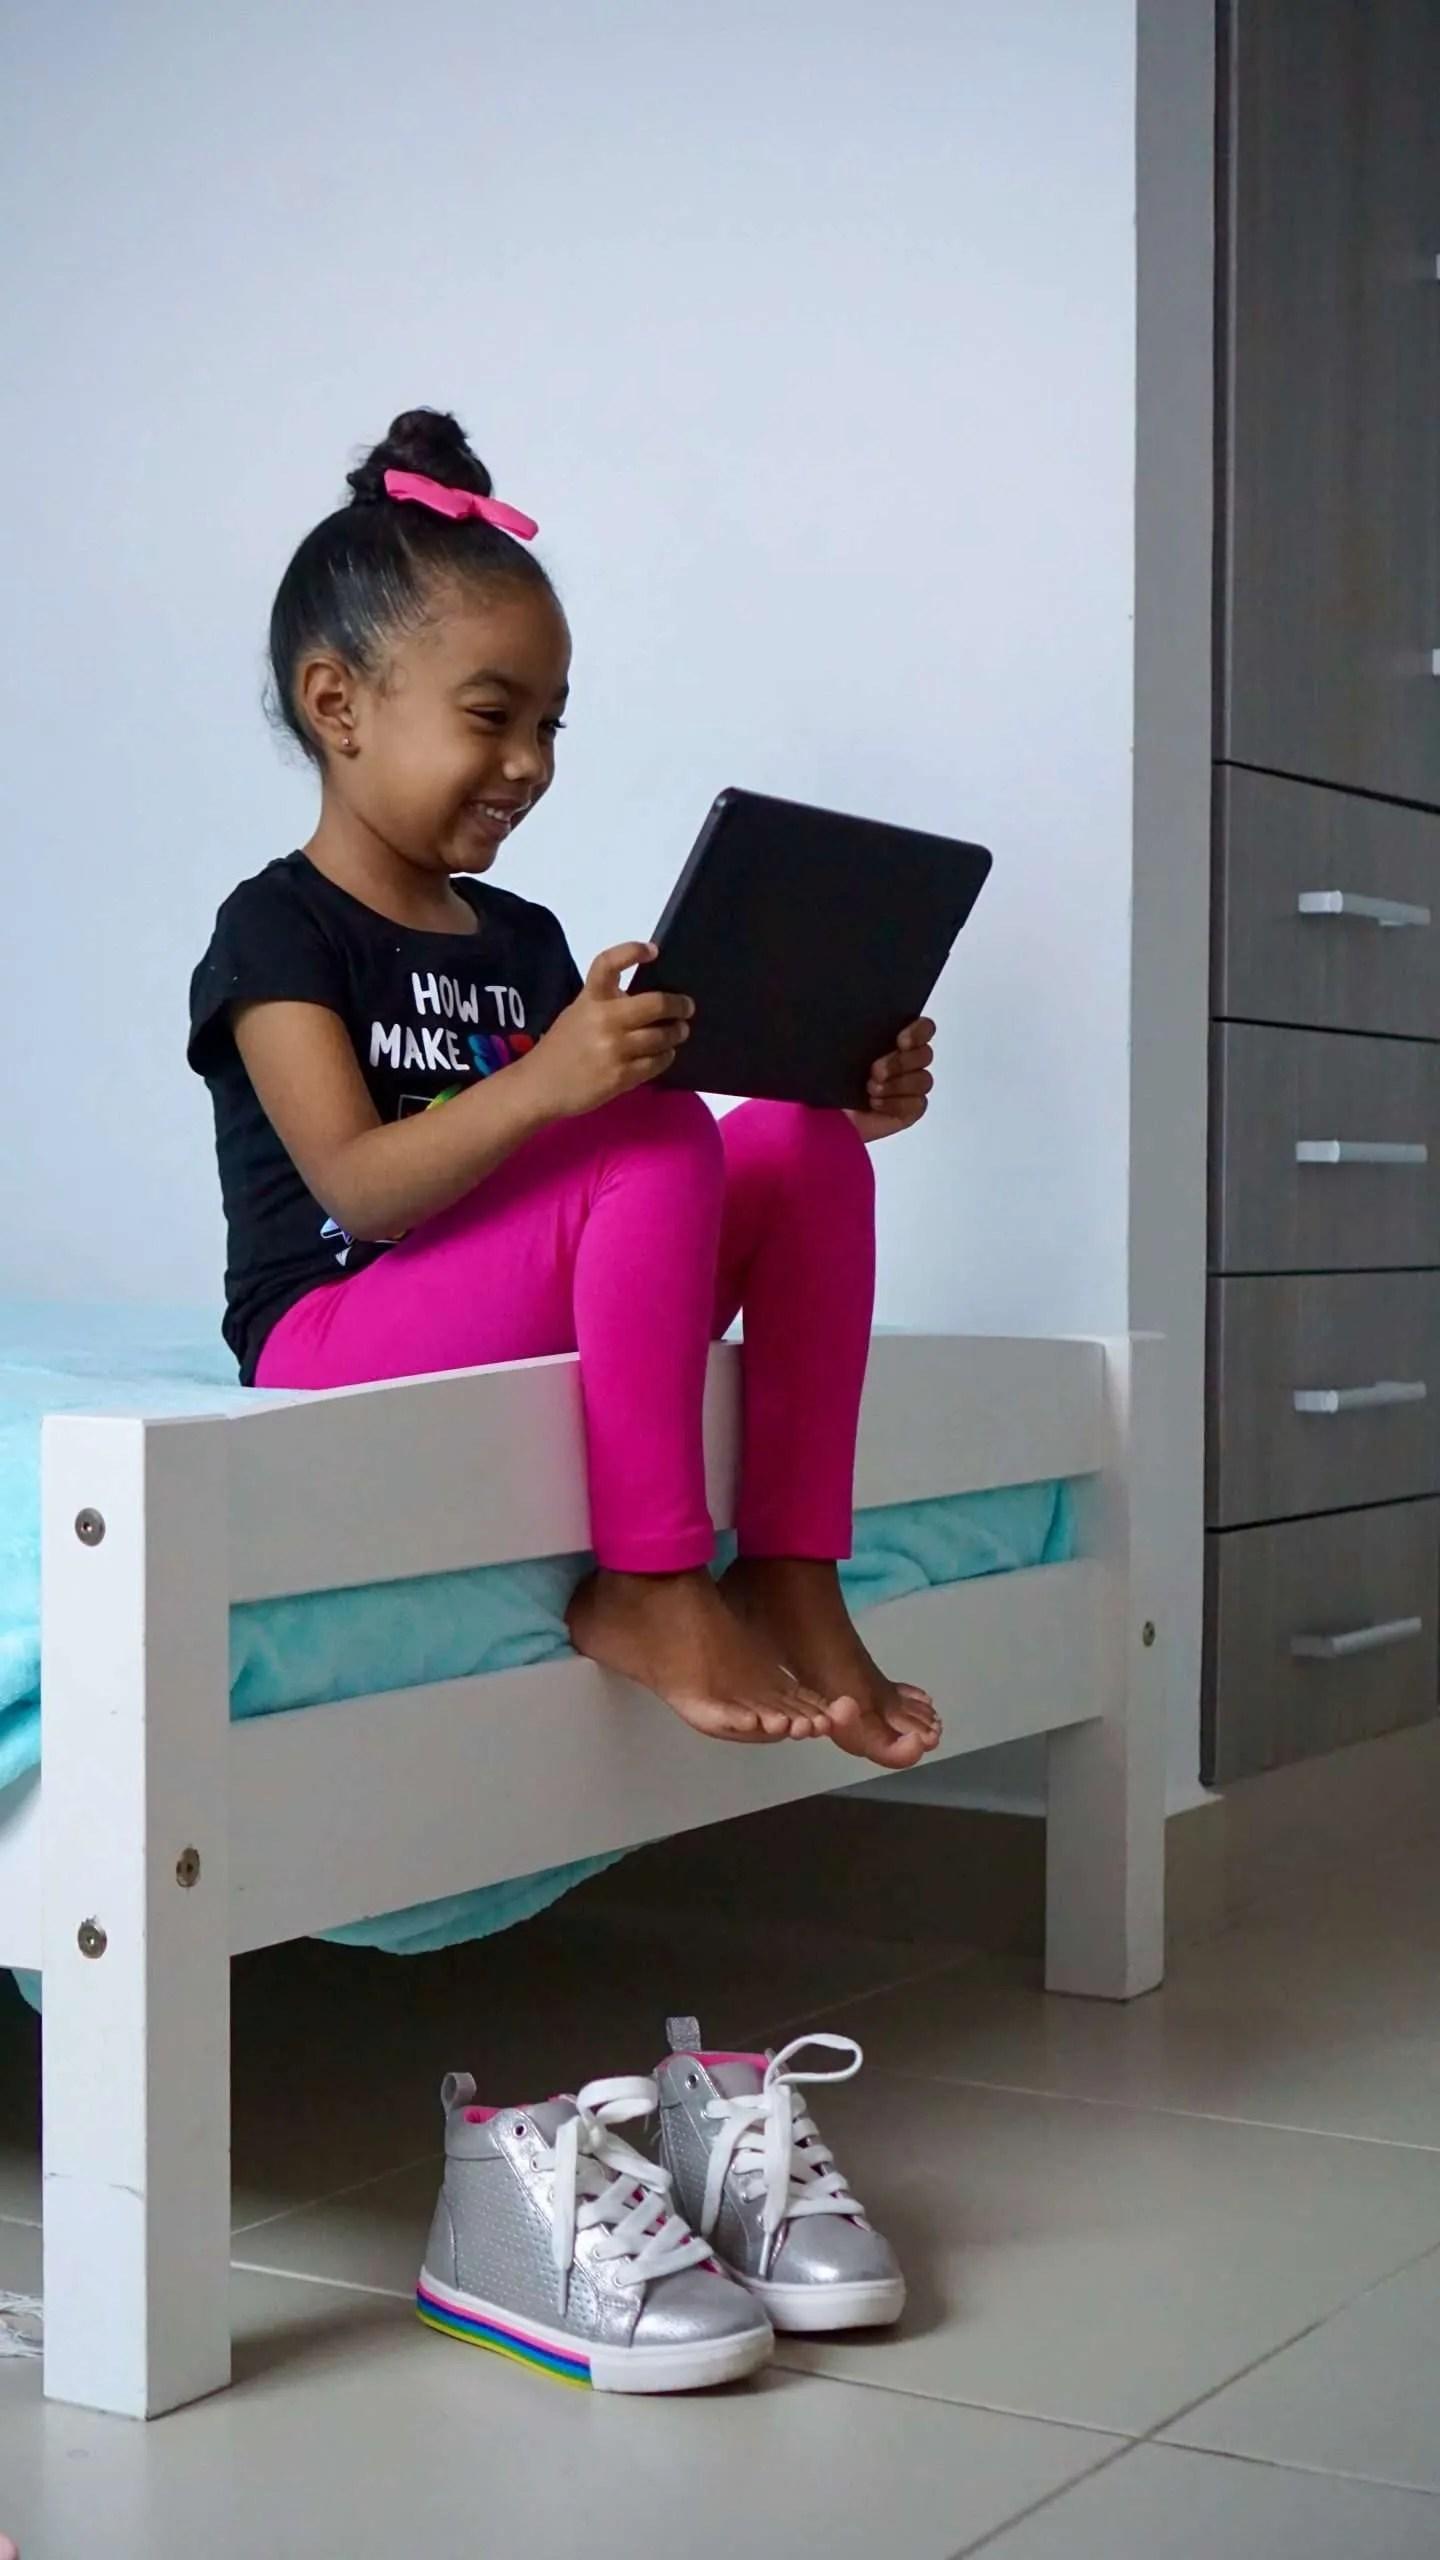 Stylish kids, bedroom decor, back to school, online school, shopping online,